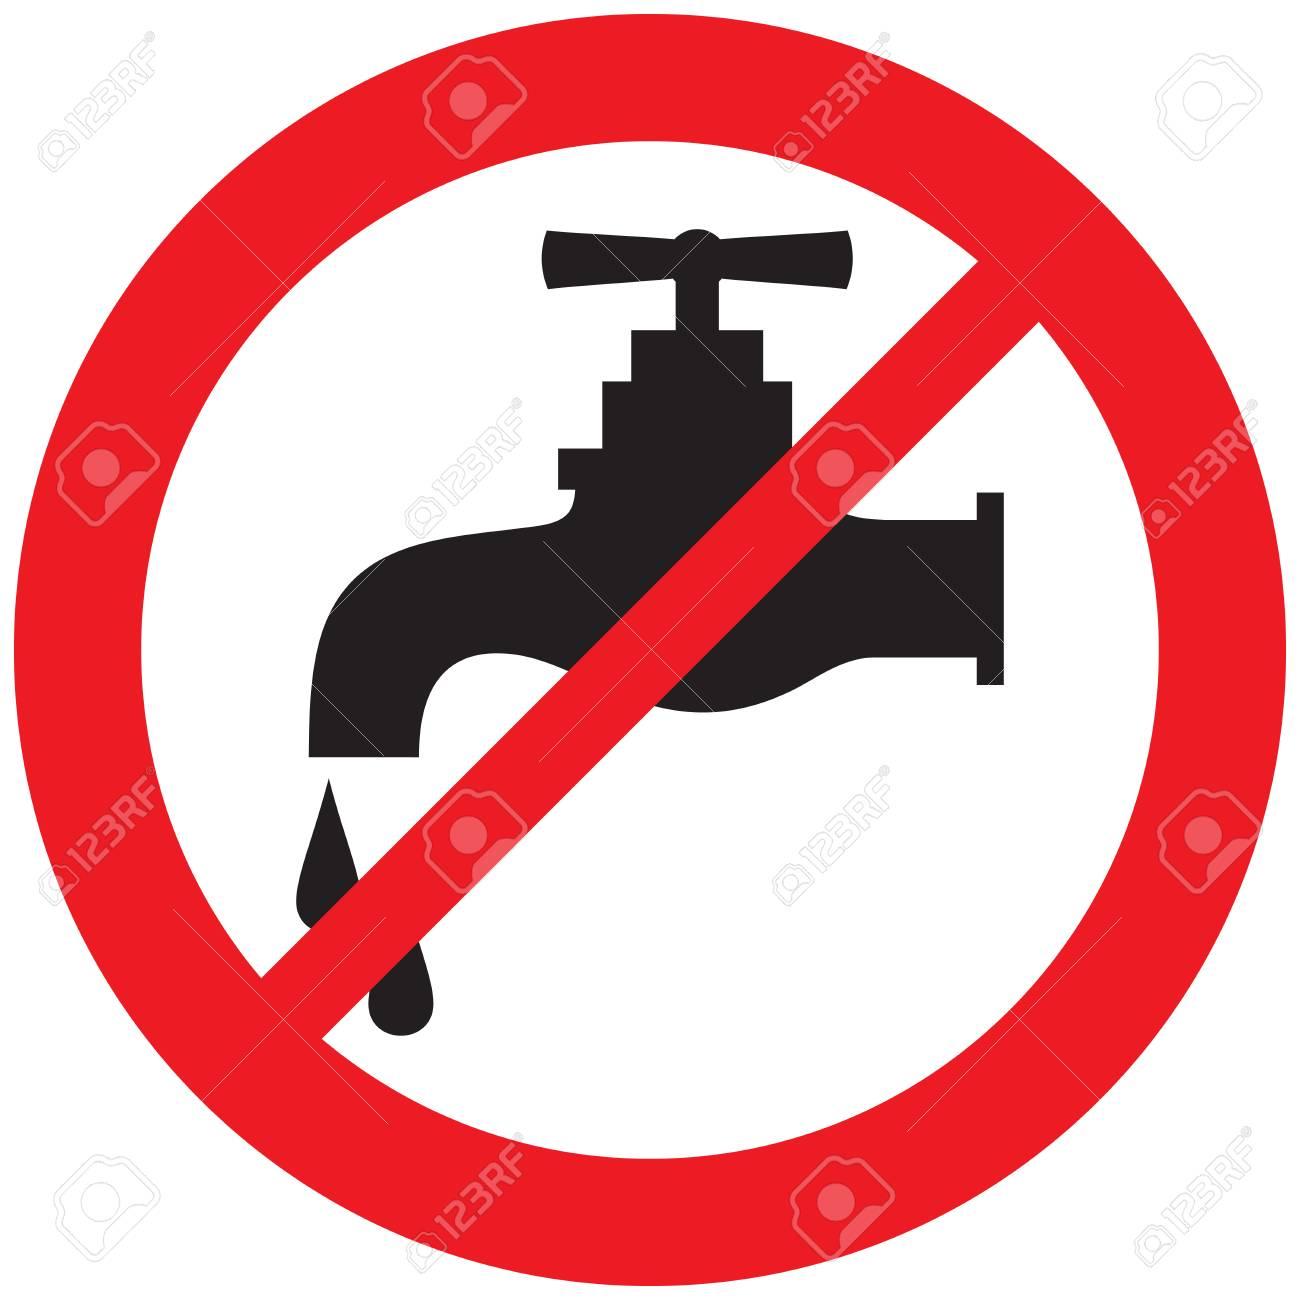 no water tap symbol - 101210505